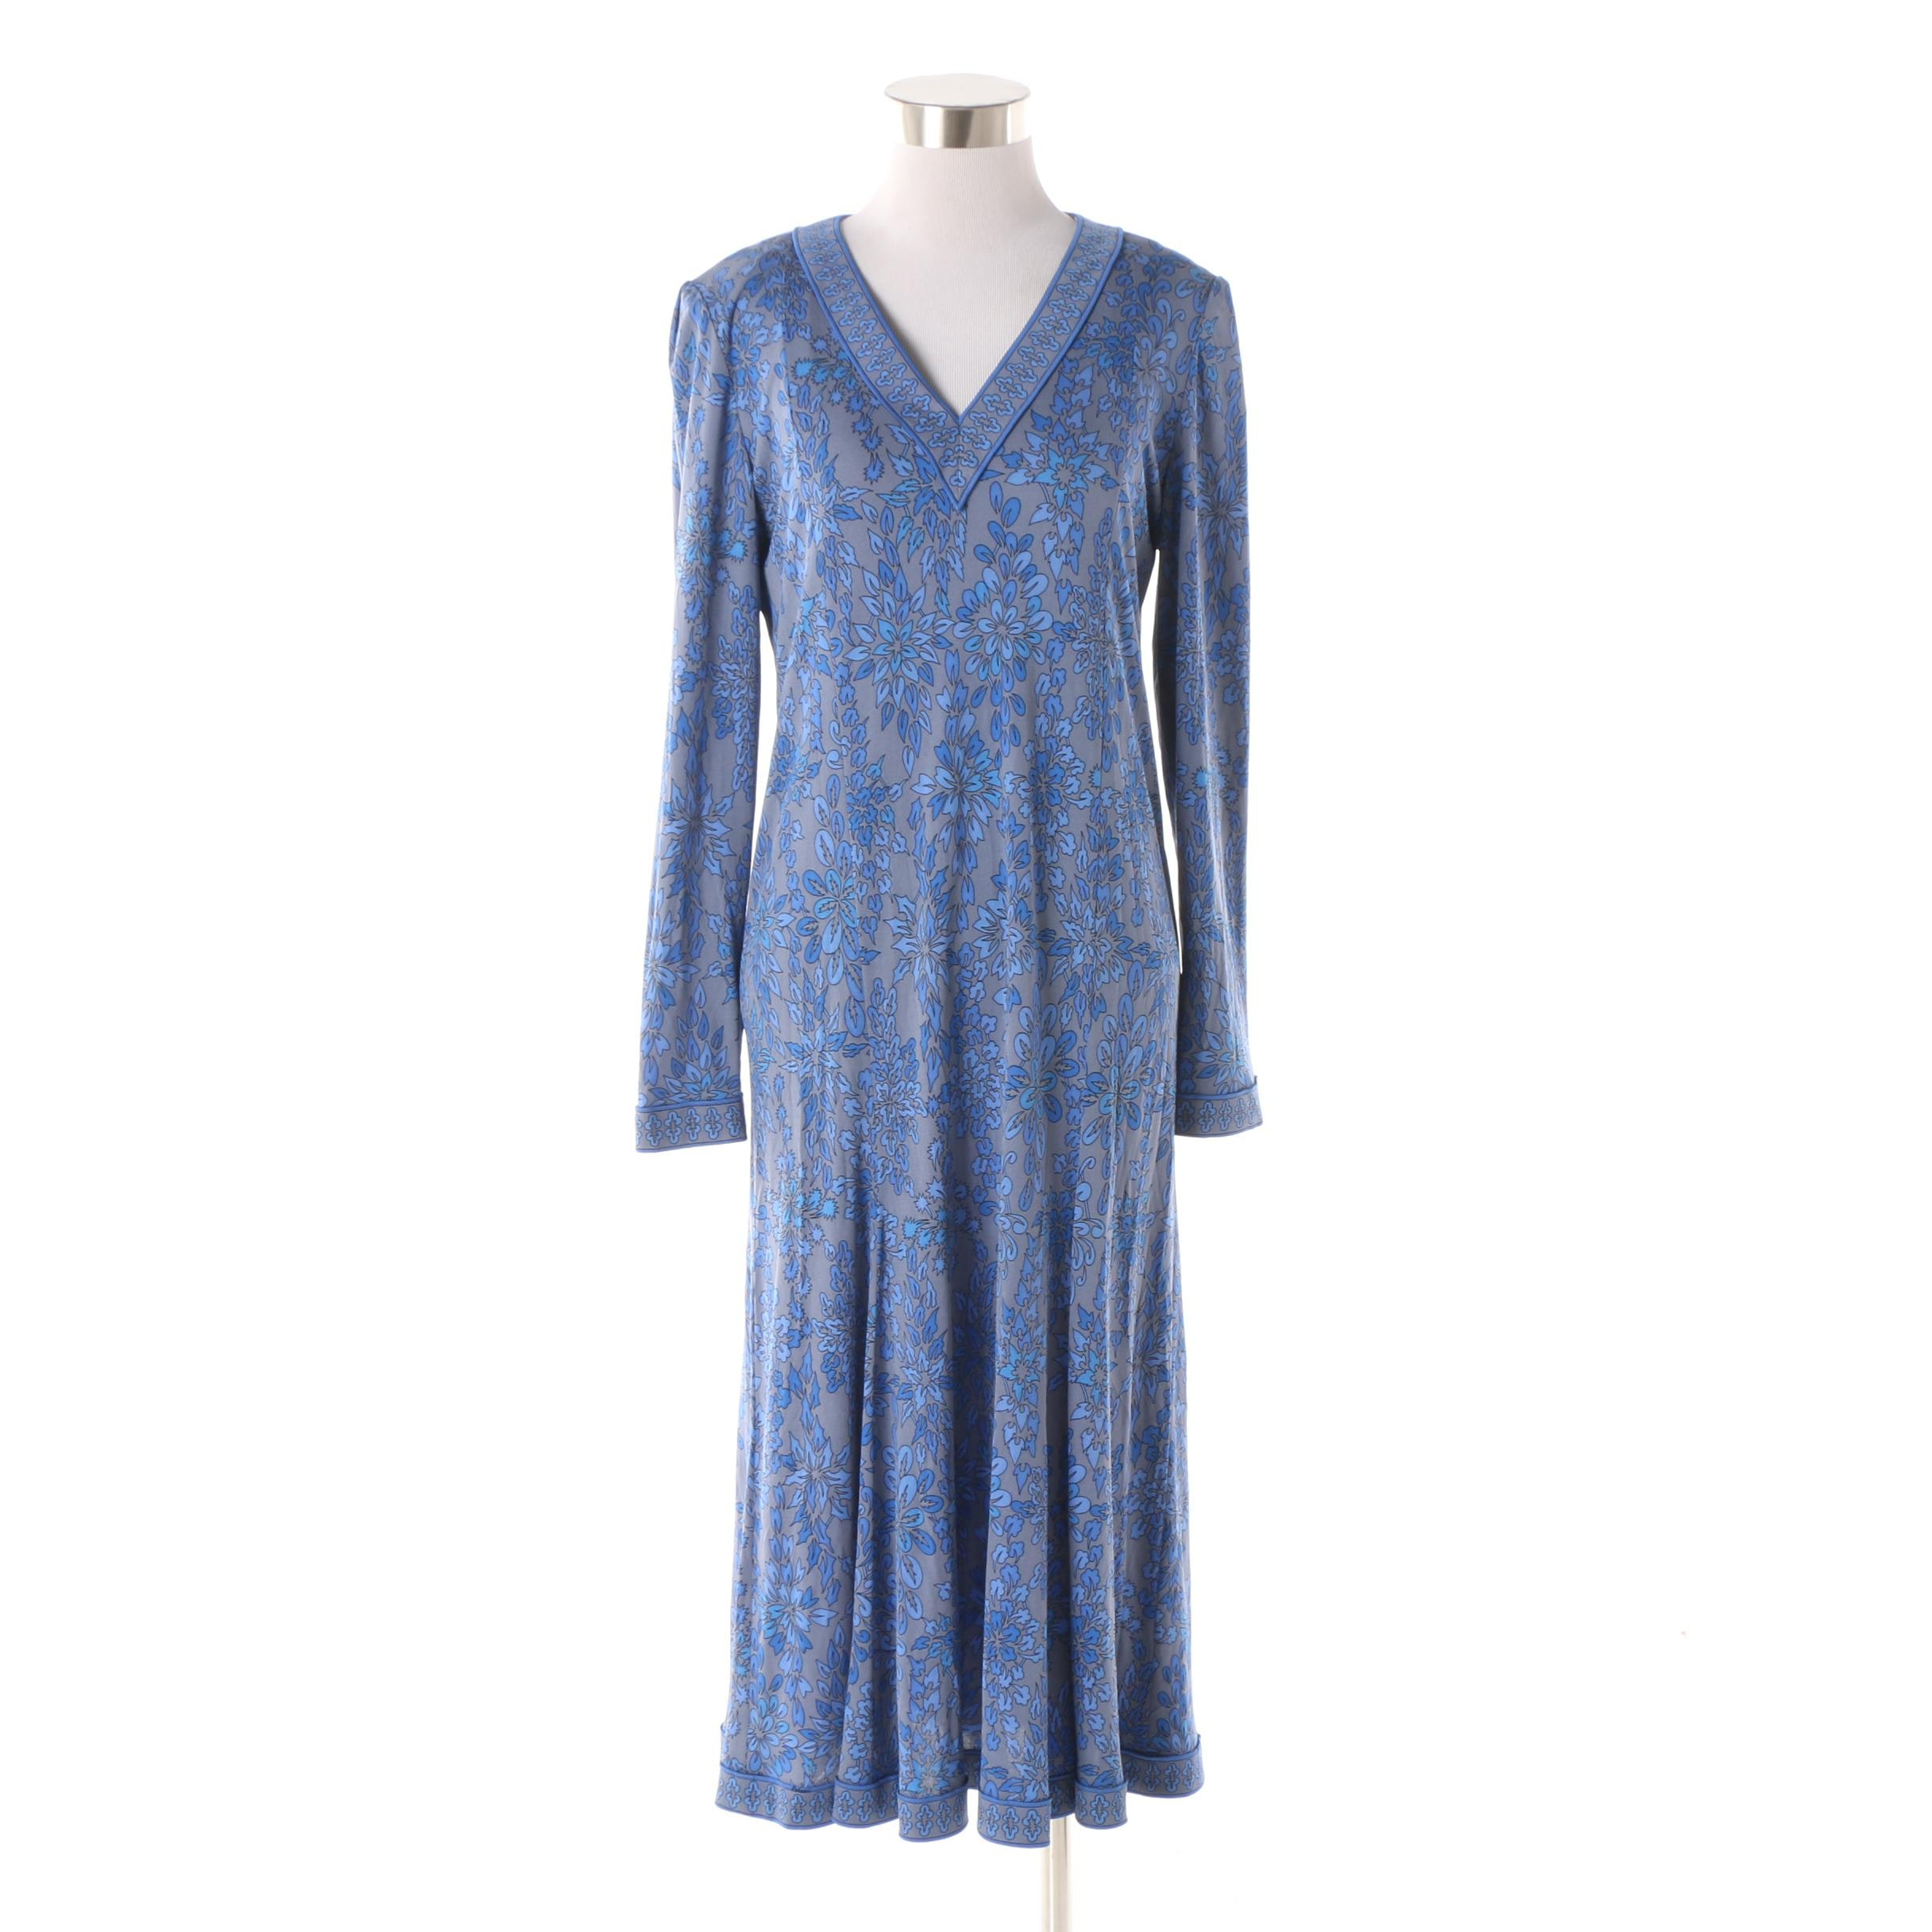 1970s Vintage Averardo Bessi Blue Floral Print Silk Jersey Dress